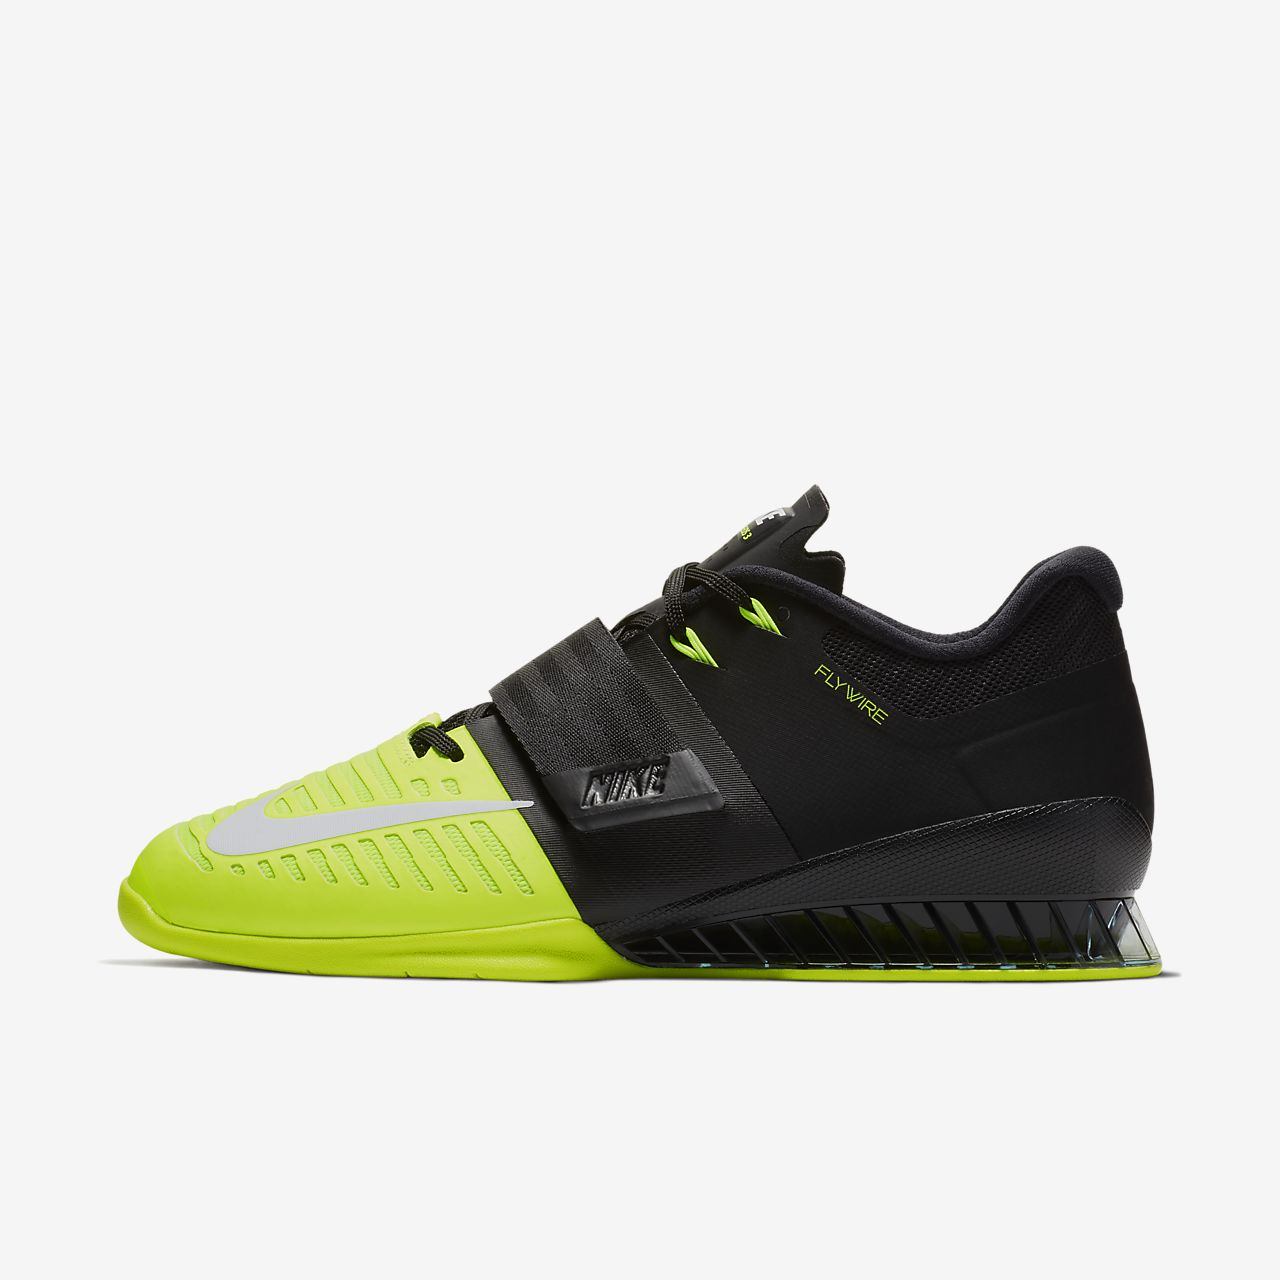 Nike Flyknit Treno Forza Scarpe Da Corsa Scarpe Da Ginnastica Misura UK 8